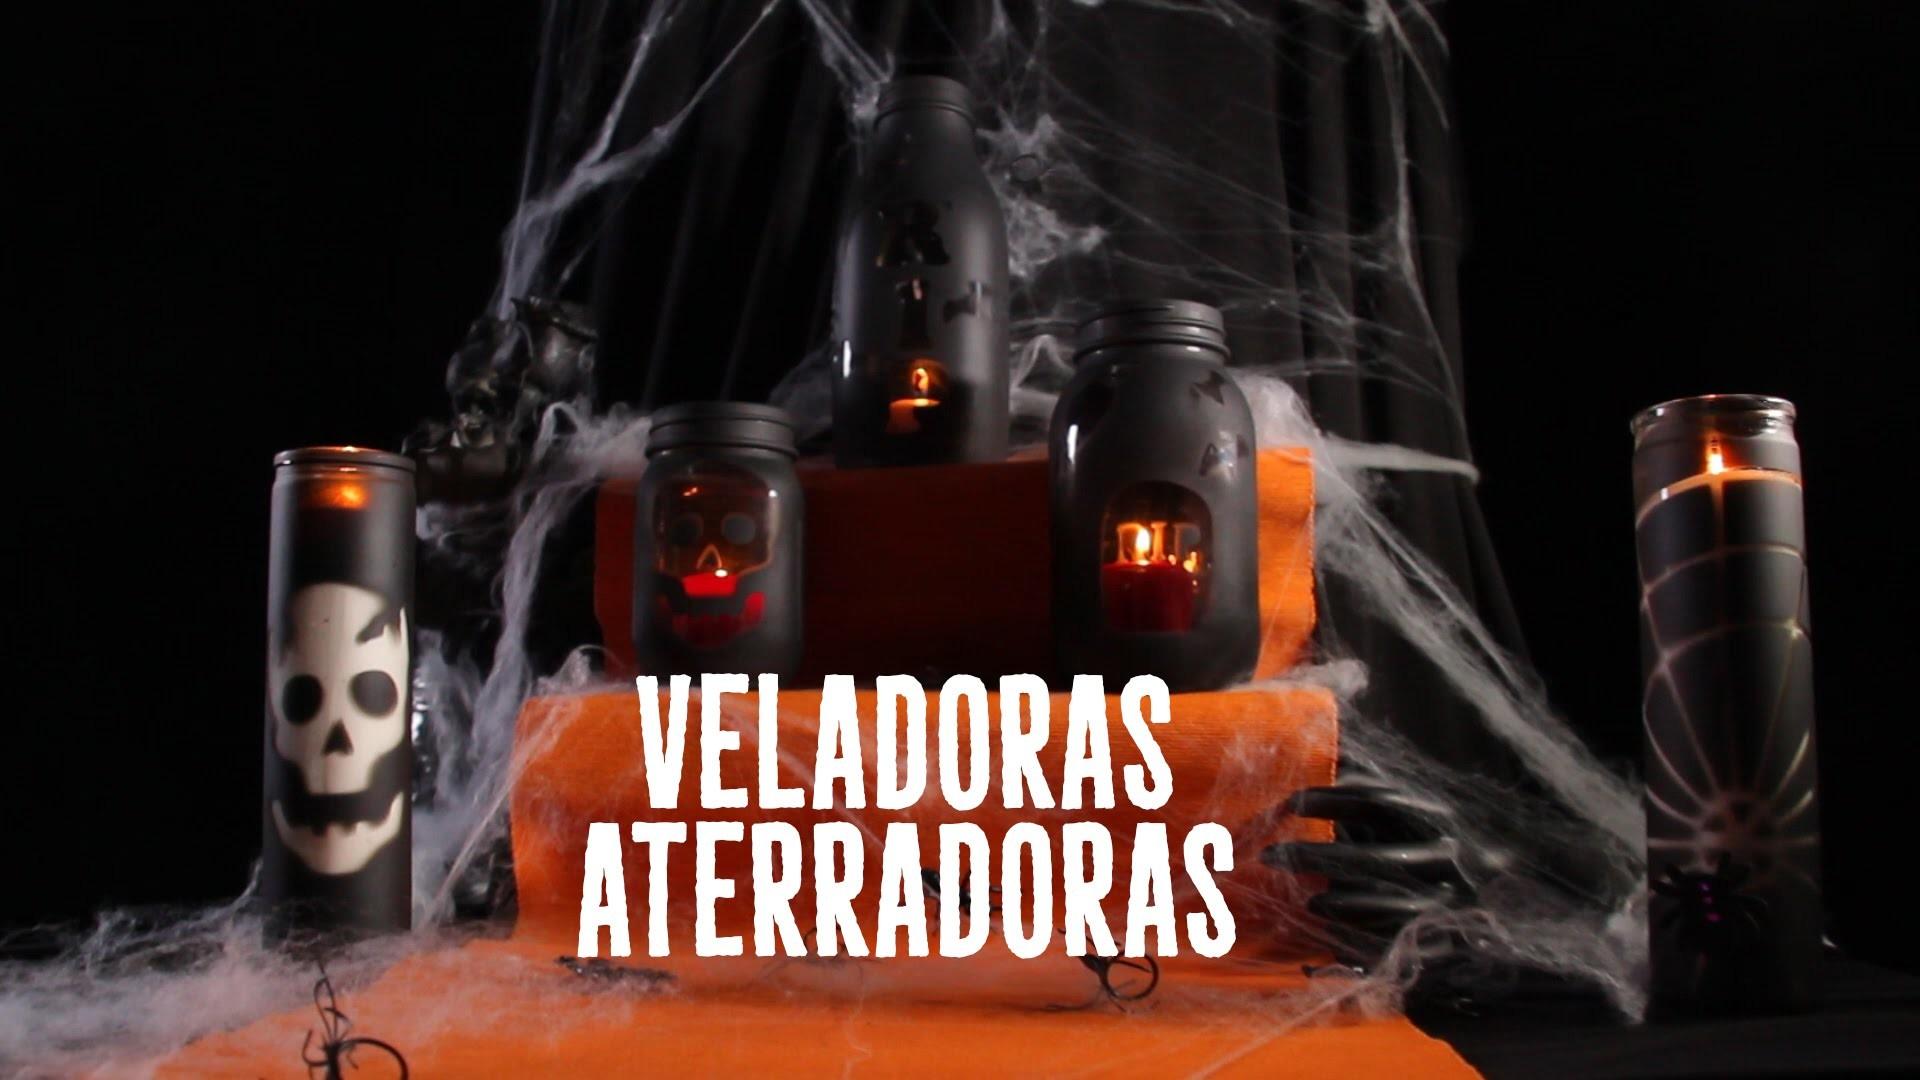 #mituTERROR - Veladoras Aterradoras